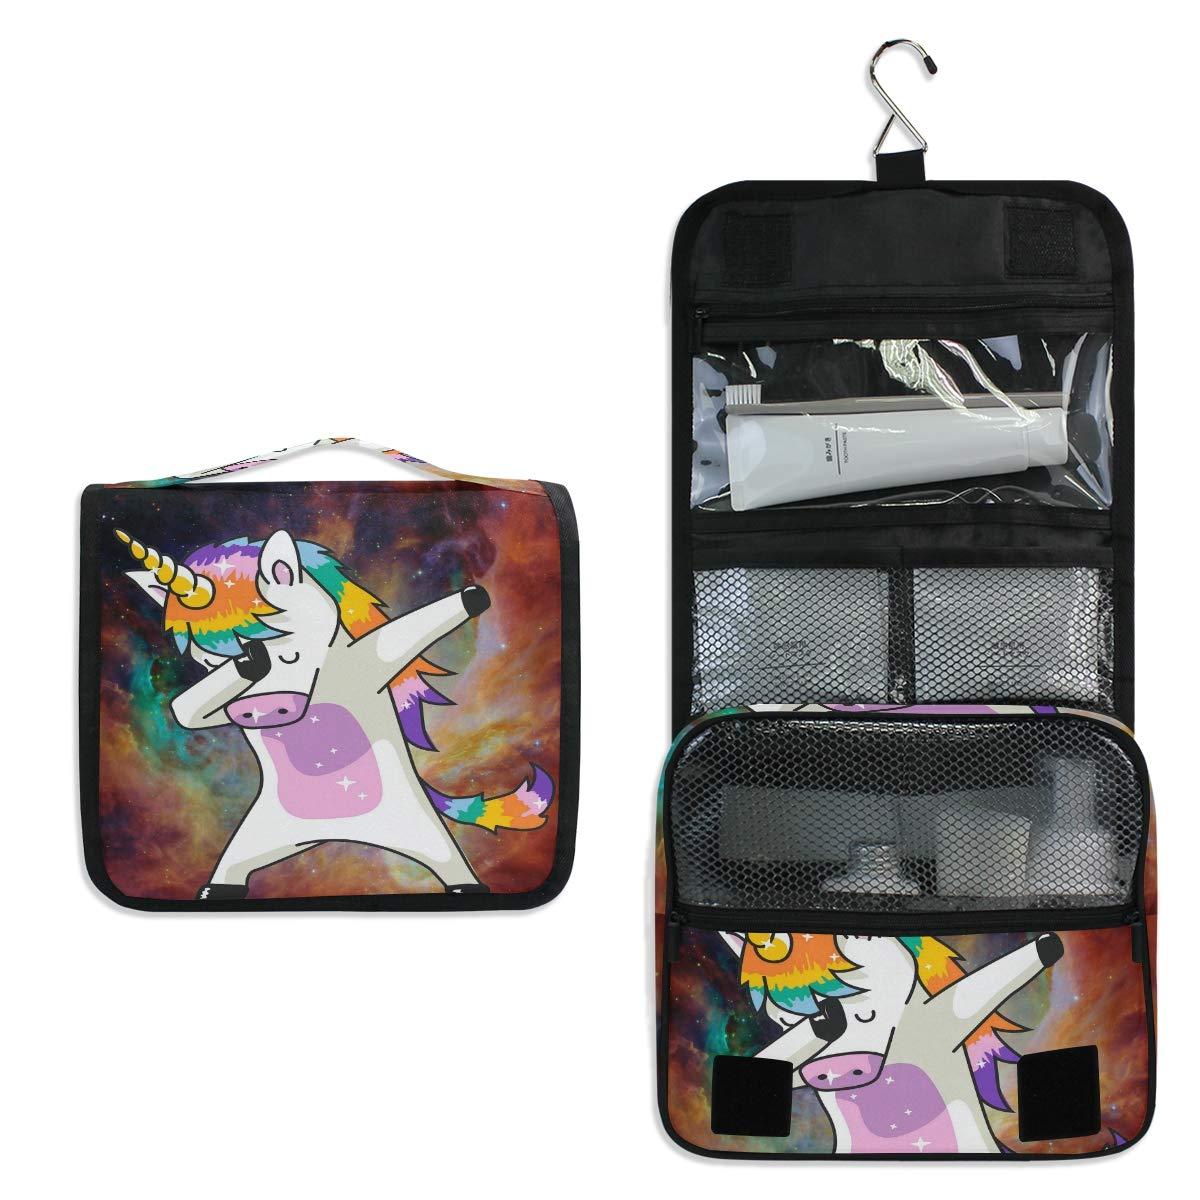 JOYPRINT Hanging Toiletry Bag Galaxy Funny Animal Unicorn, Makeup Bag Cosmetic Bag Bathroom Travel Organizer Large for Women Girls